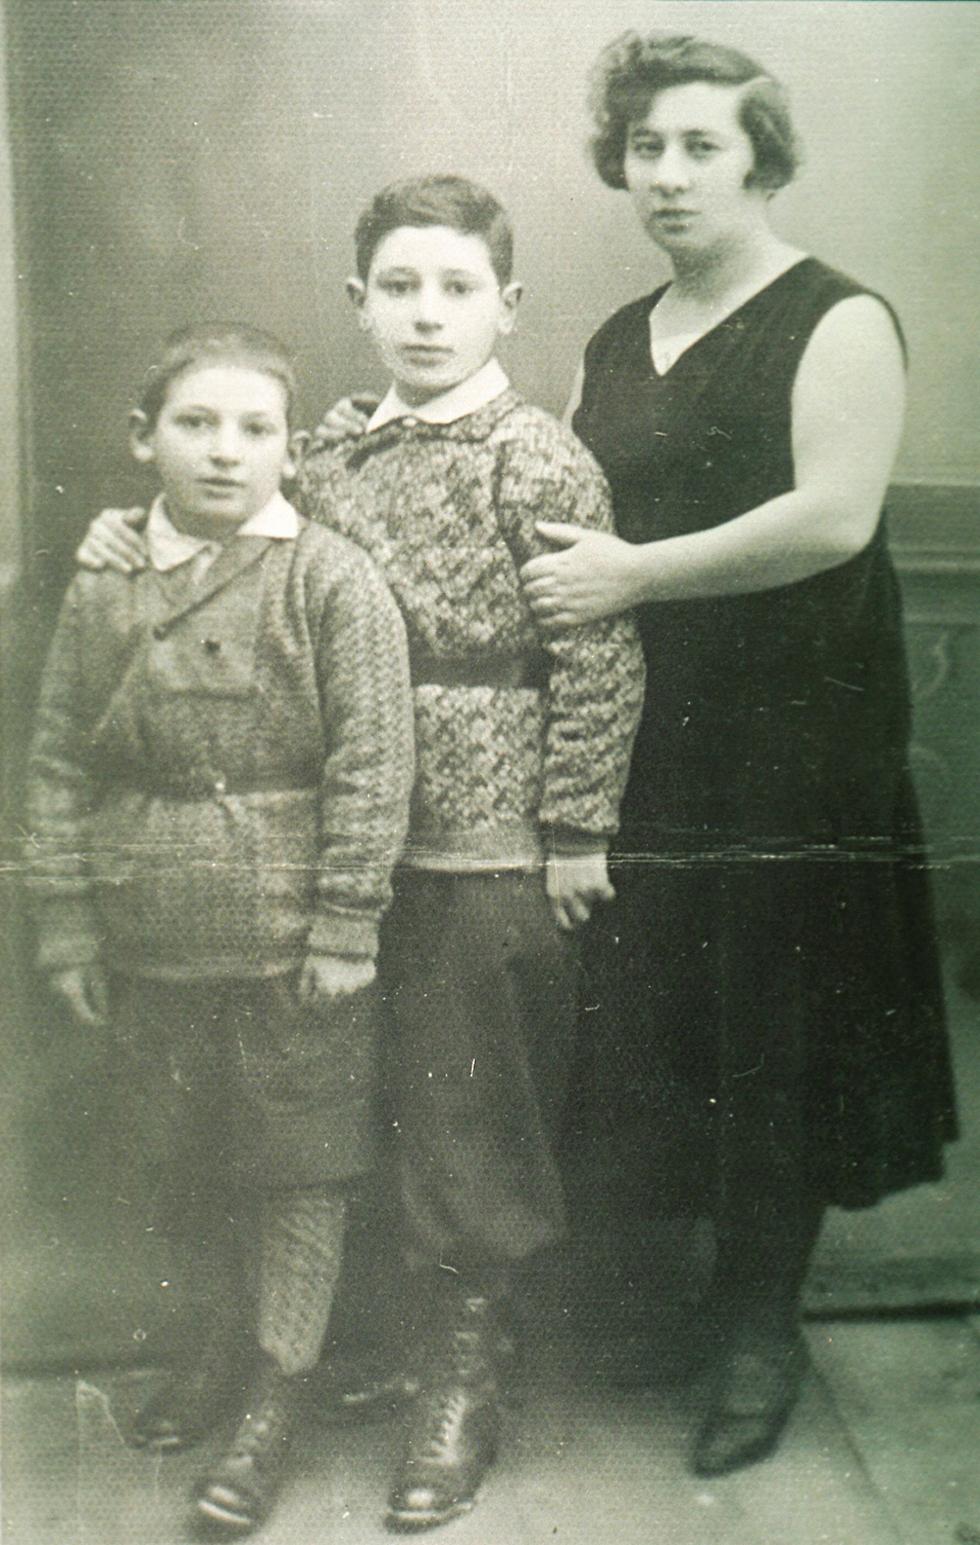 Peres as a child (Photo: Shimon Peres Archive)